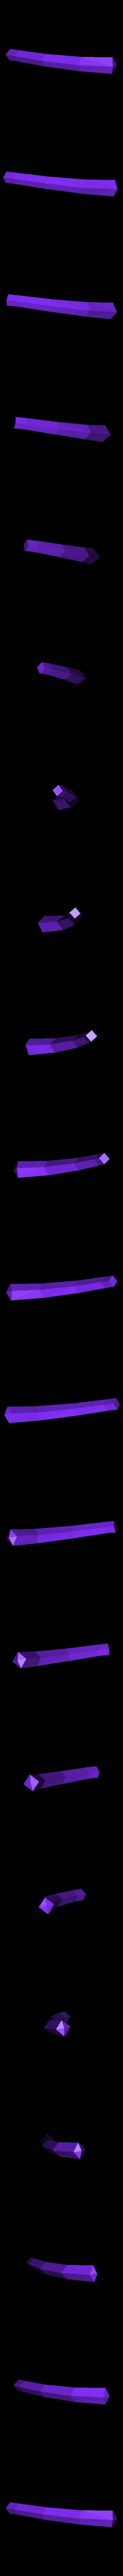 Pear_c.stl Download free STL file Pear Casket • 3D printing design, KuKu